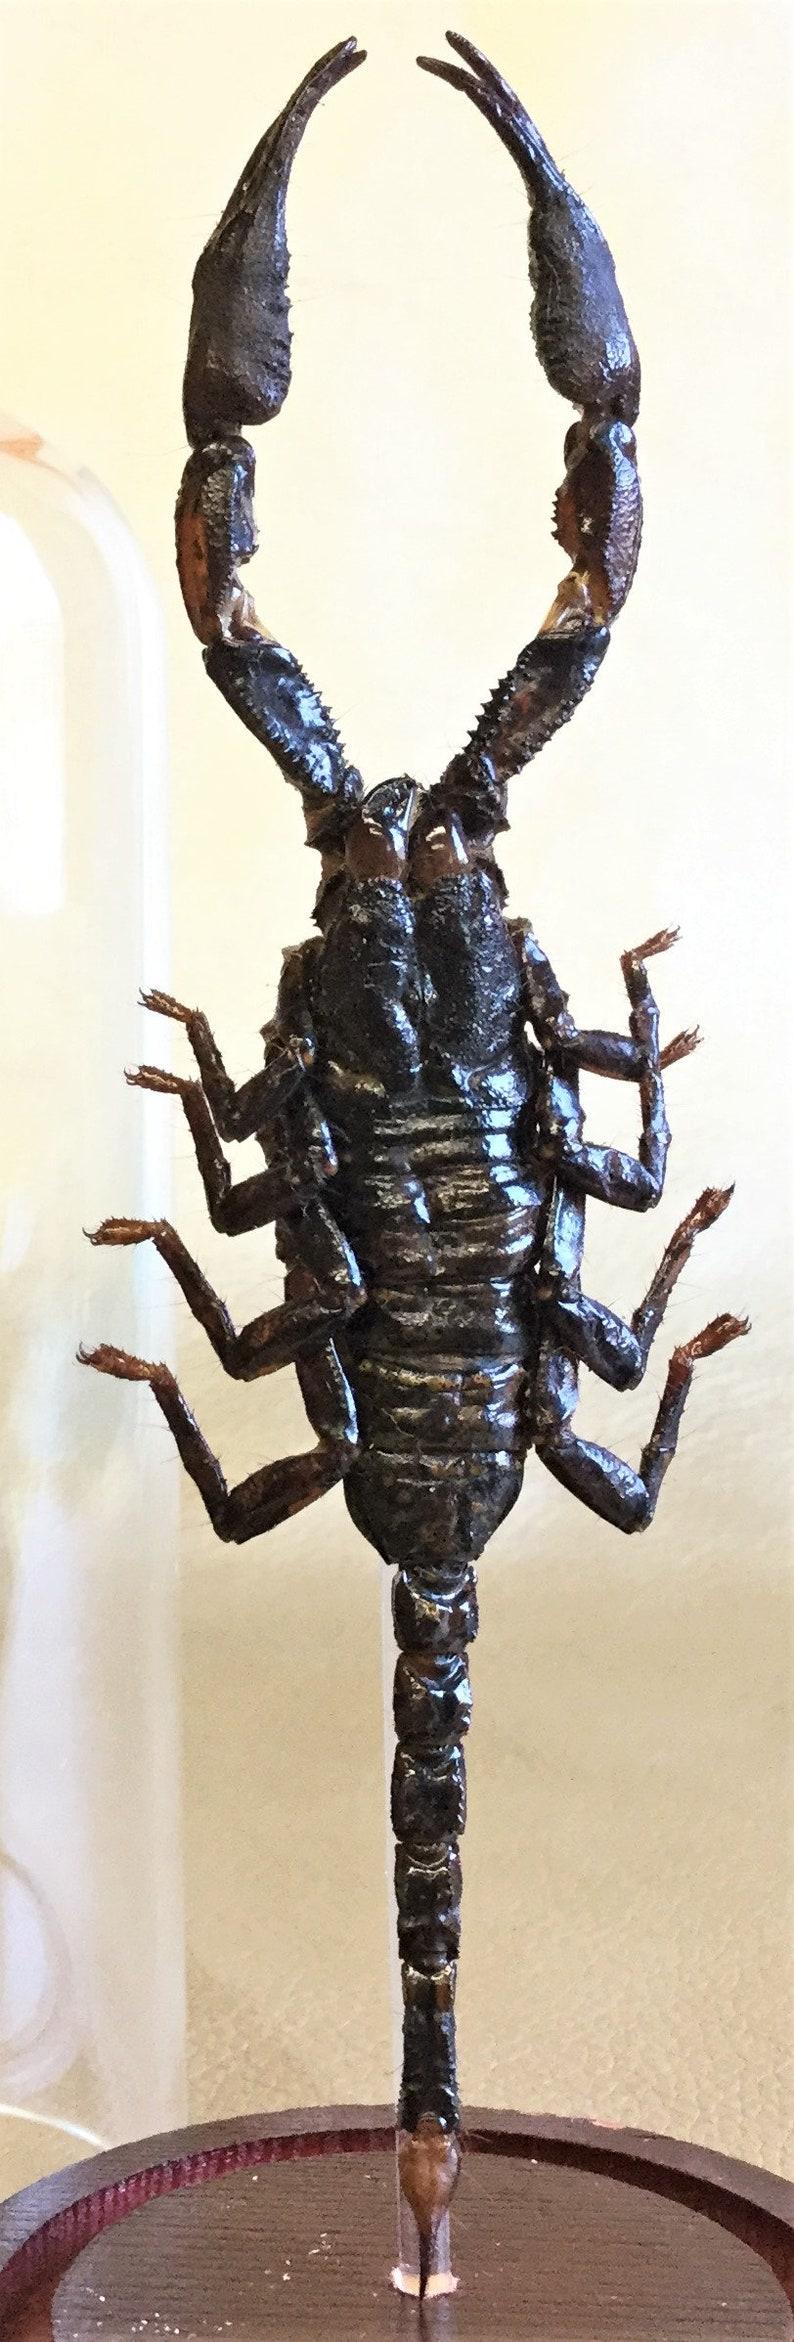 Liophysa collectible specimen educational curiosity Q38c  Taxidermy Entomology Lg Black Scorpion Glass Dome Display H